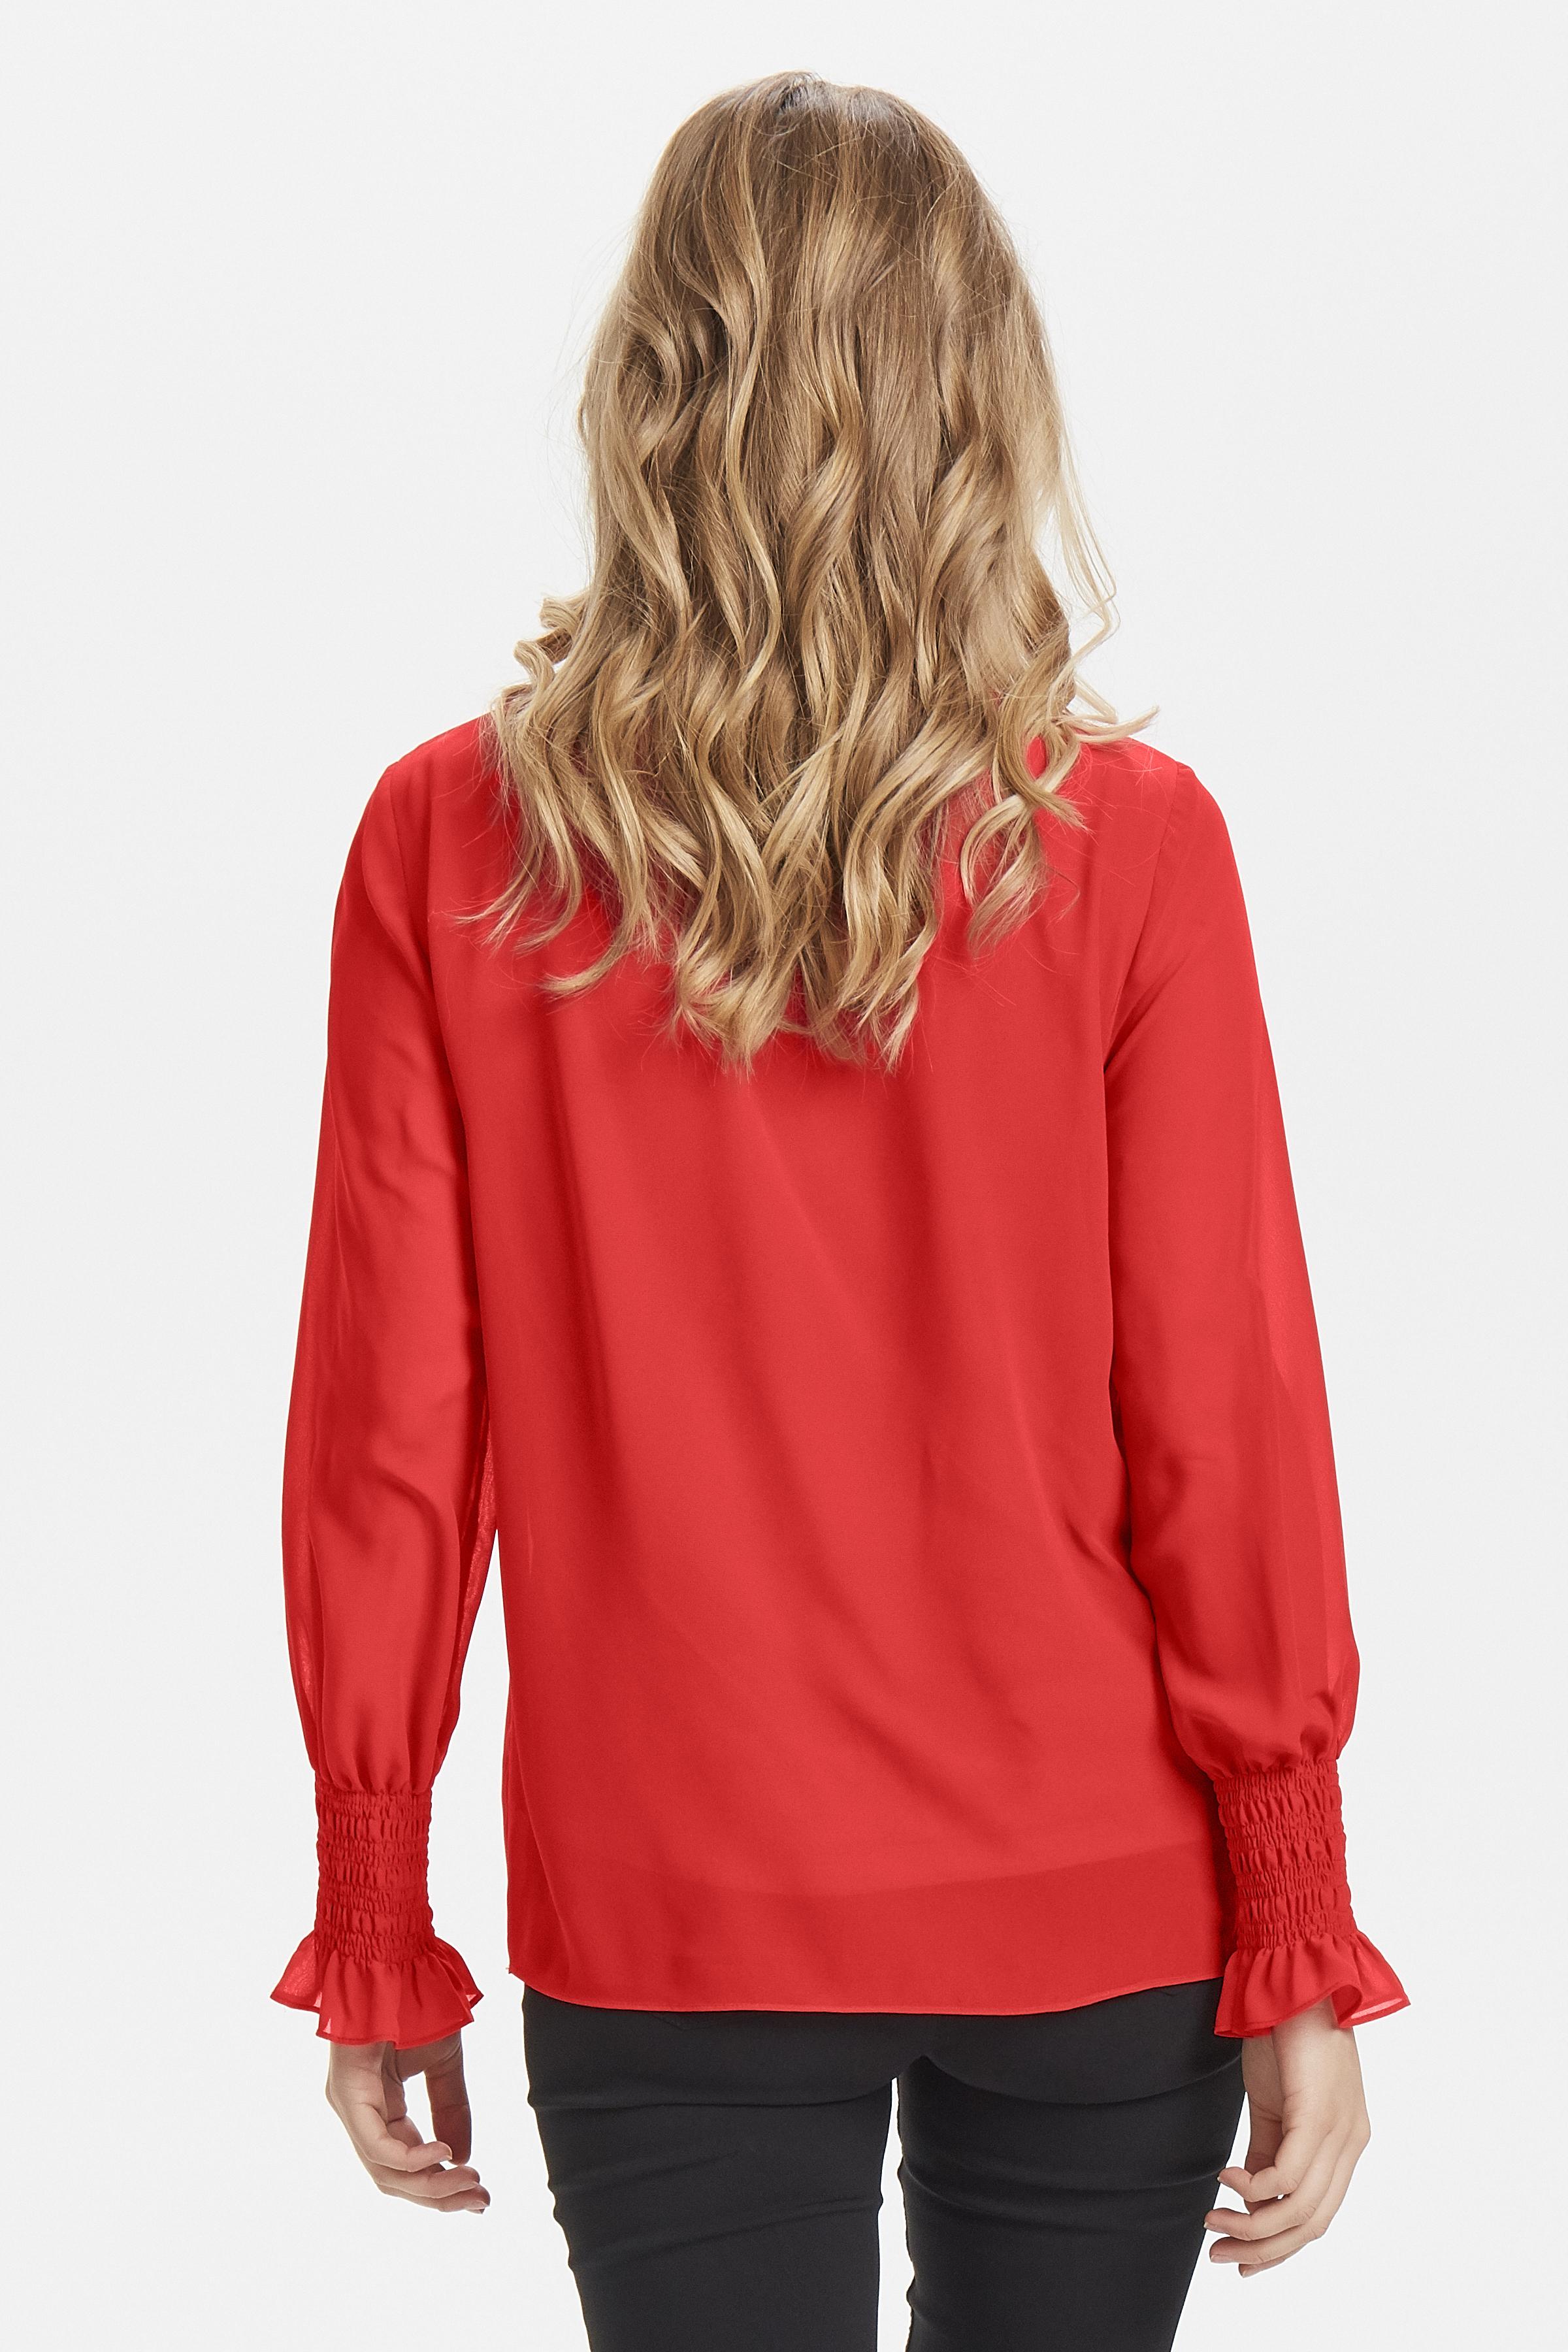 Chinese Red Langermet bluse fra b.young - Kjøp Chinese Red Langermet bluse fra størrelse 34-42 her